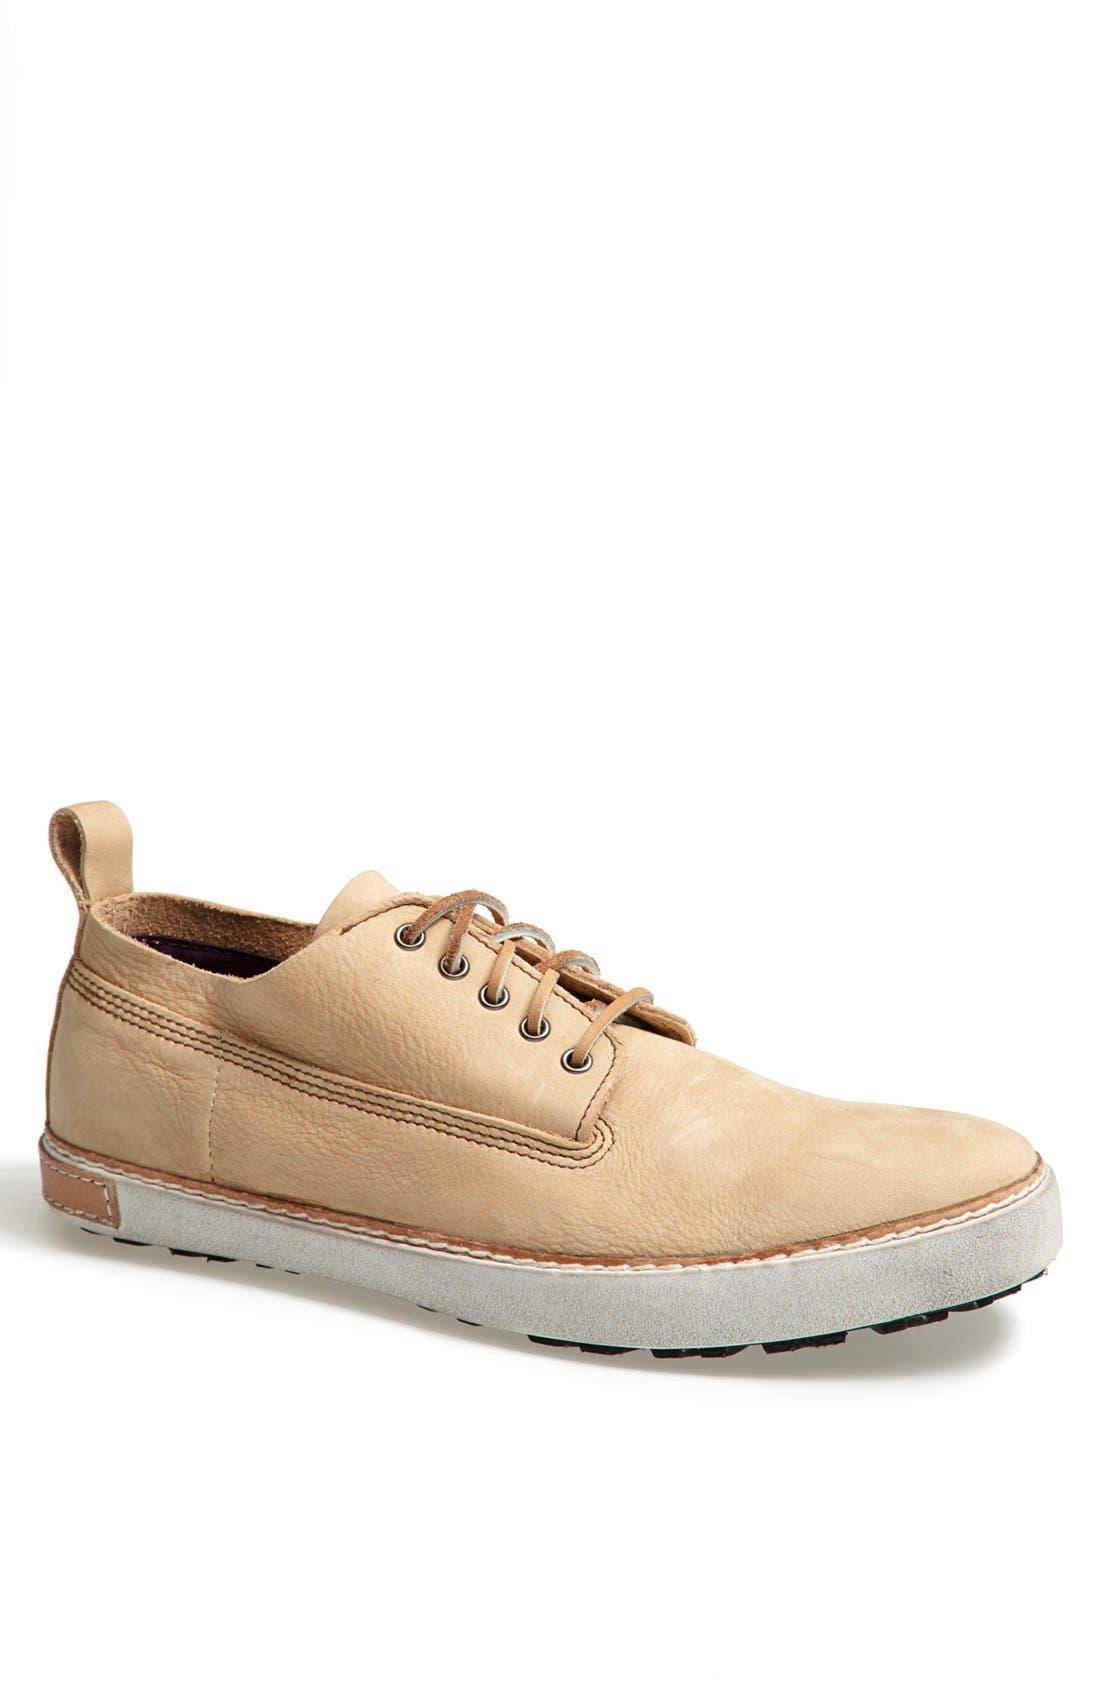 Alternate Image 1 Selected - Blackstone 'DM 10' Sneaker